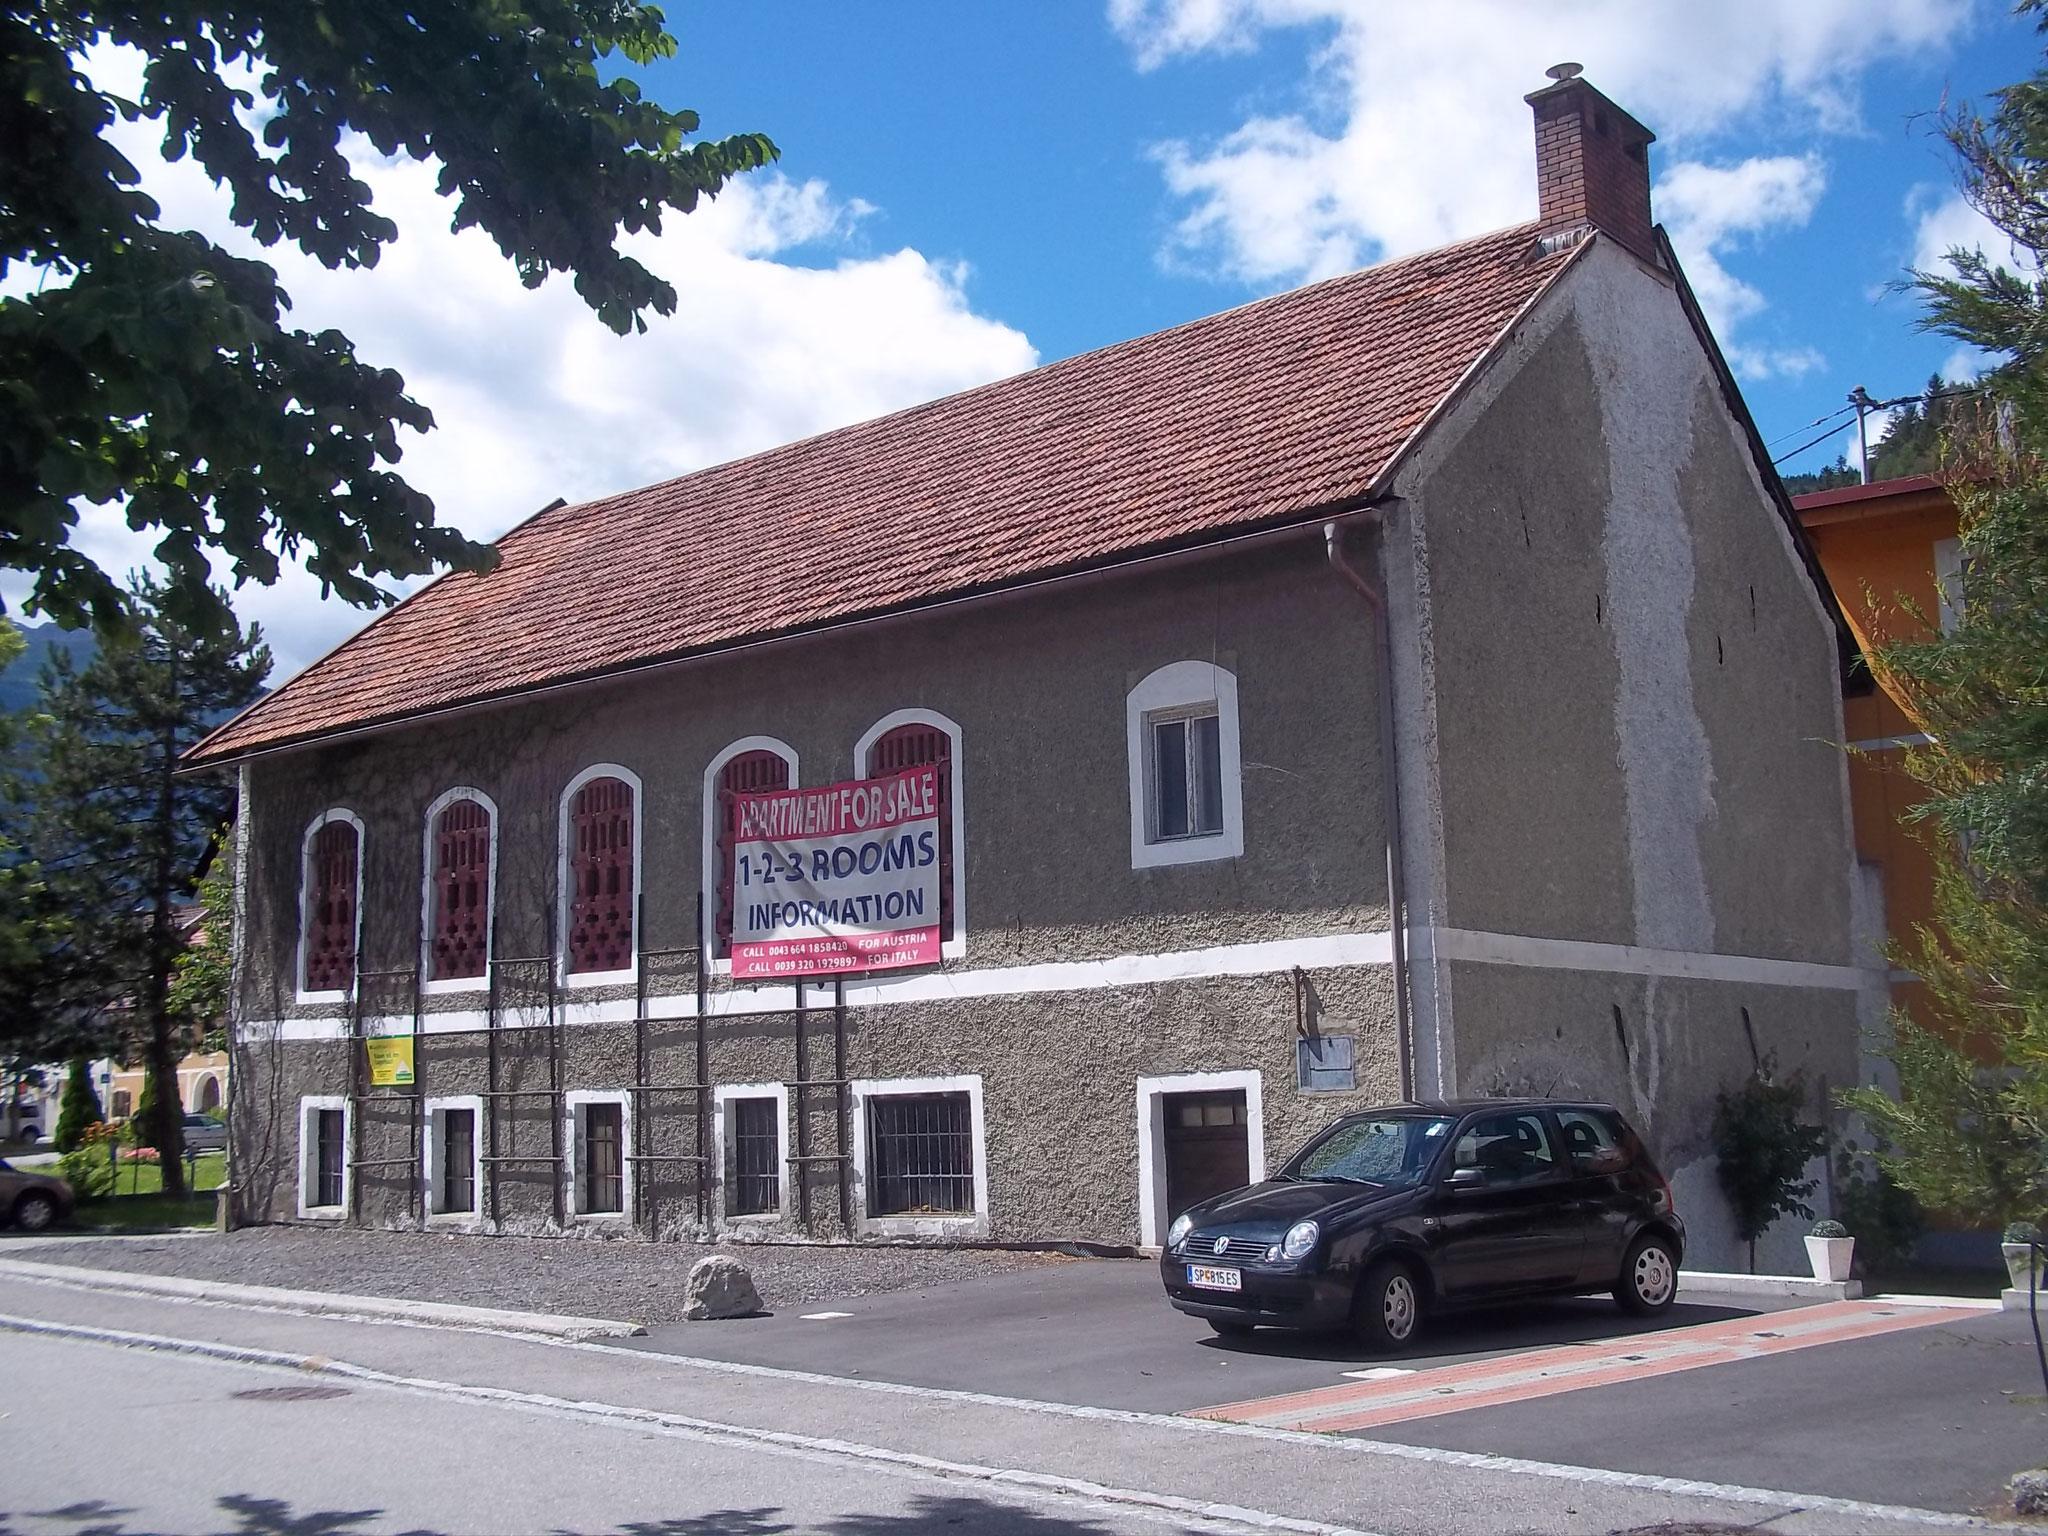 Leerstehendes Gebäude, ca. 2012